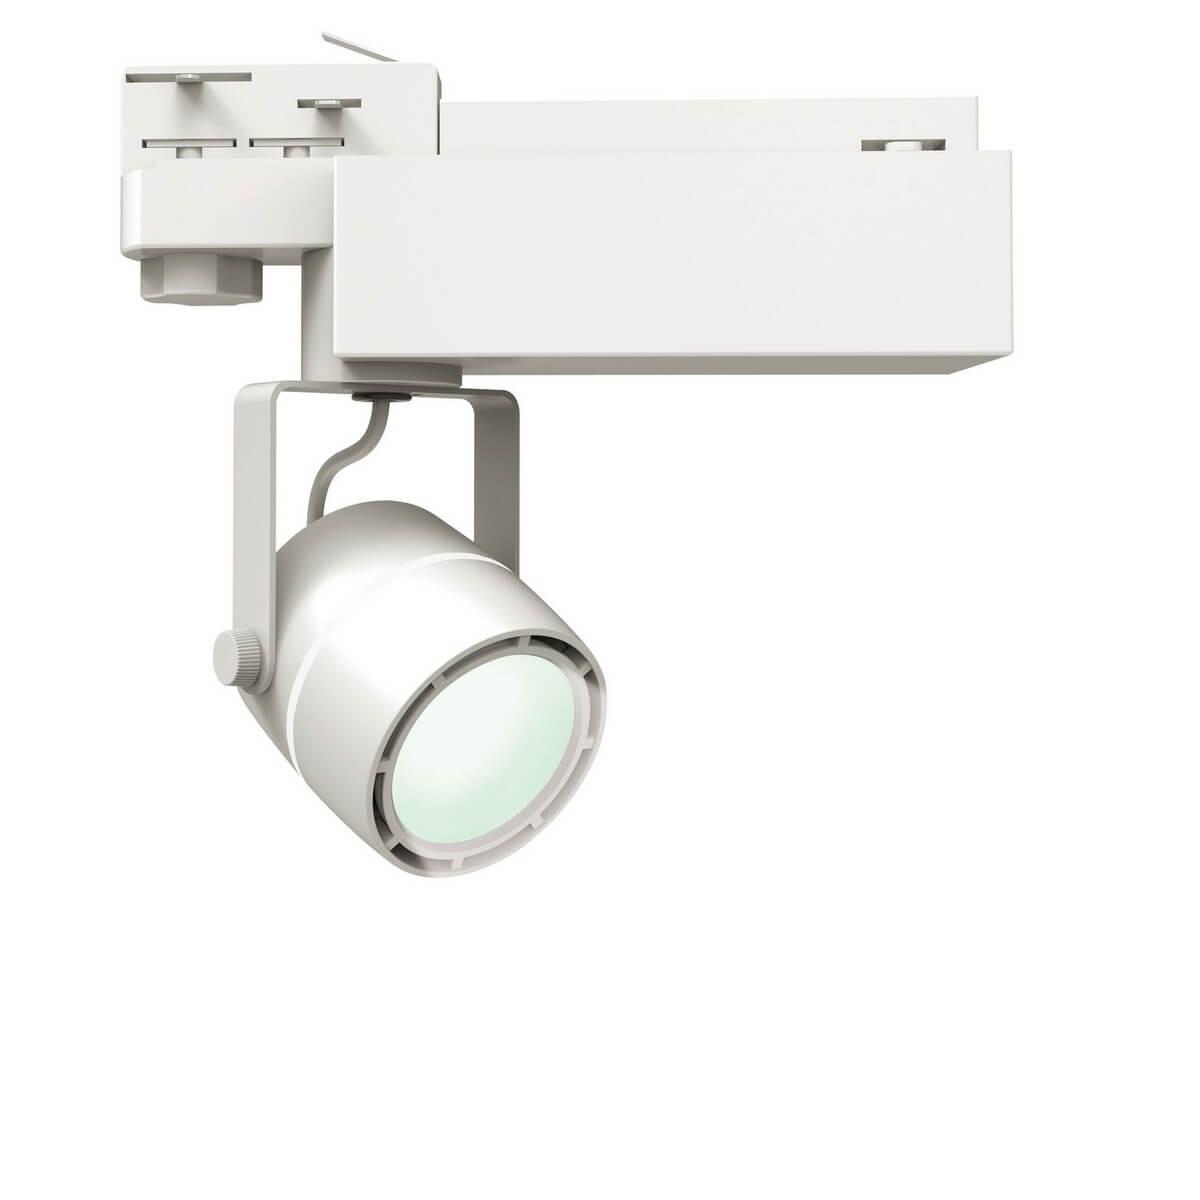 Светильник Uniel ULB-M08H-35W/NW White ULB-M08H (для трехфазного шинопровода)